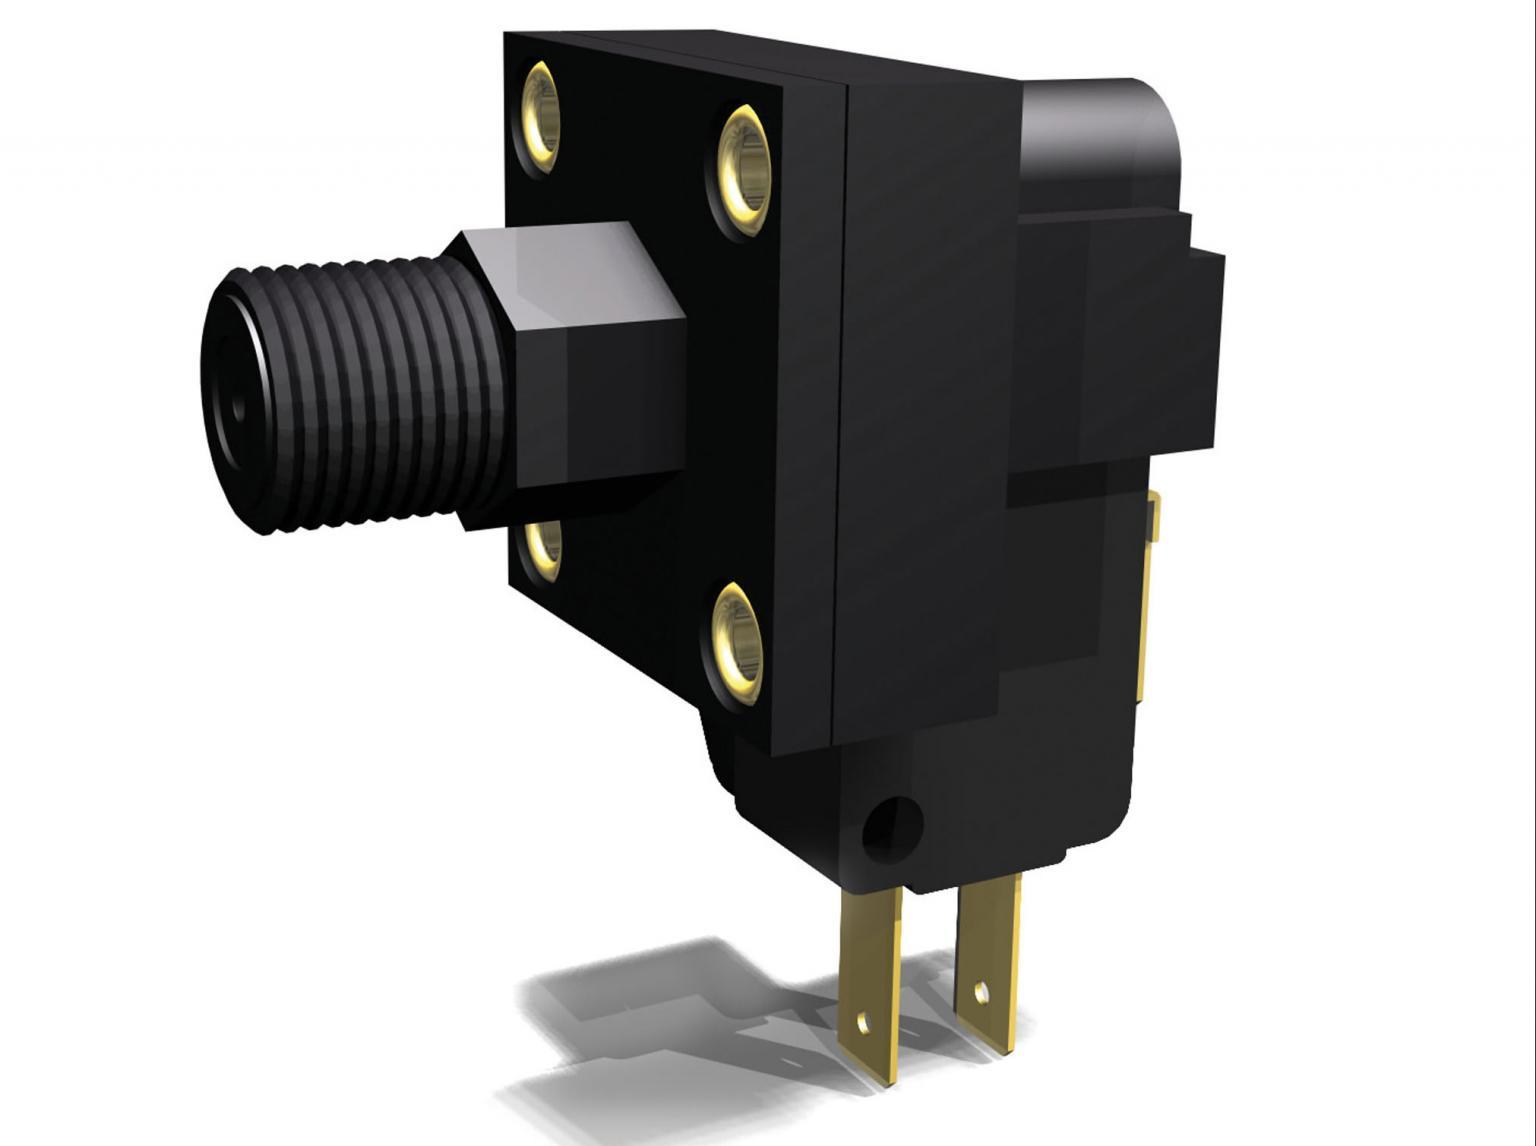 The DesignFlex PSF103 pressure switch